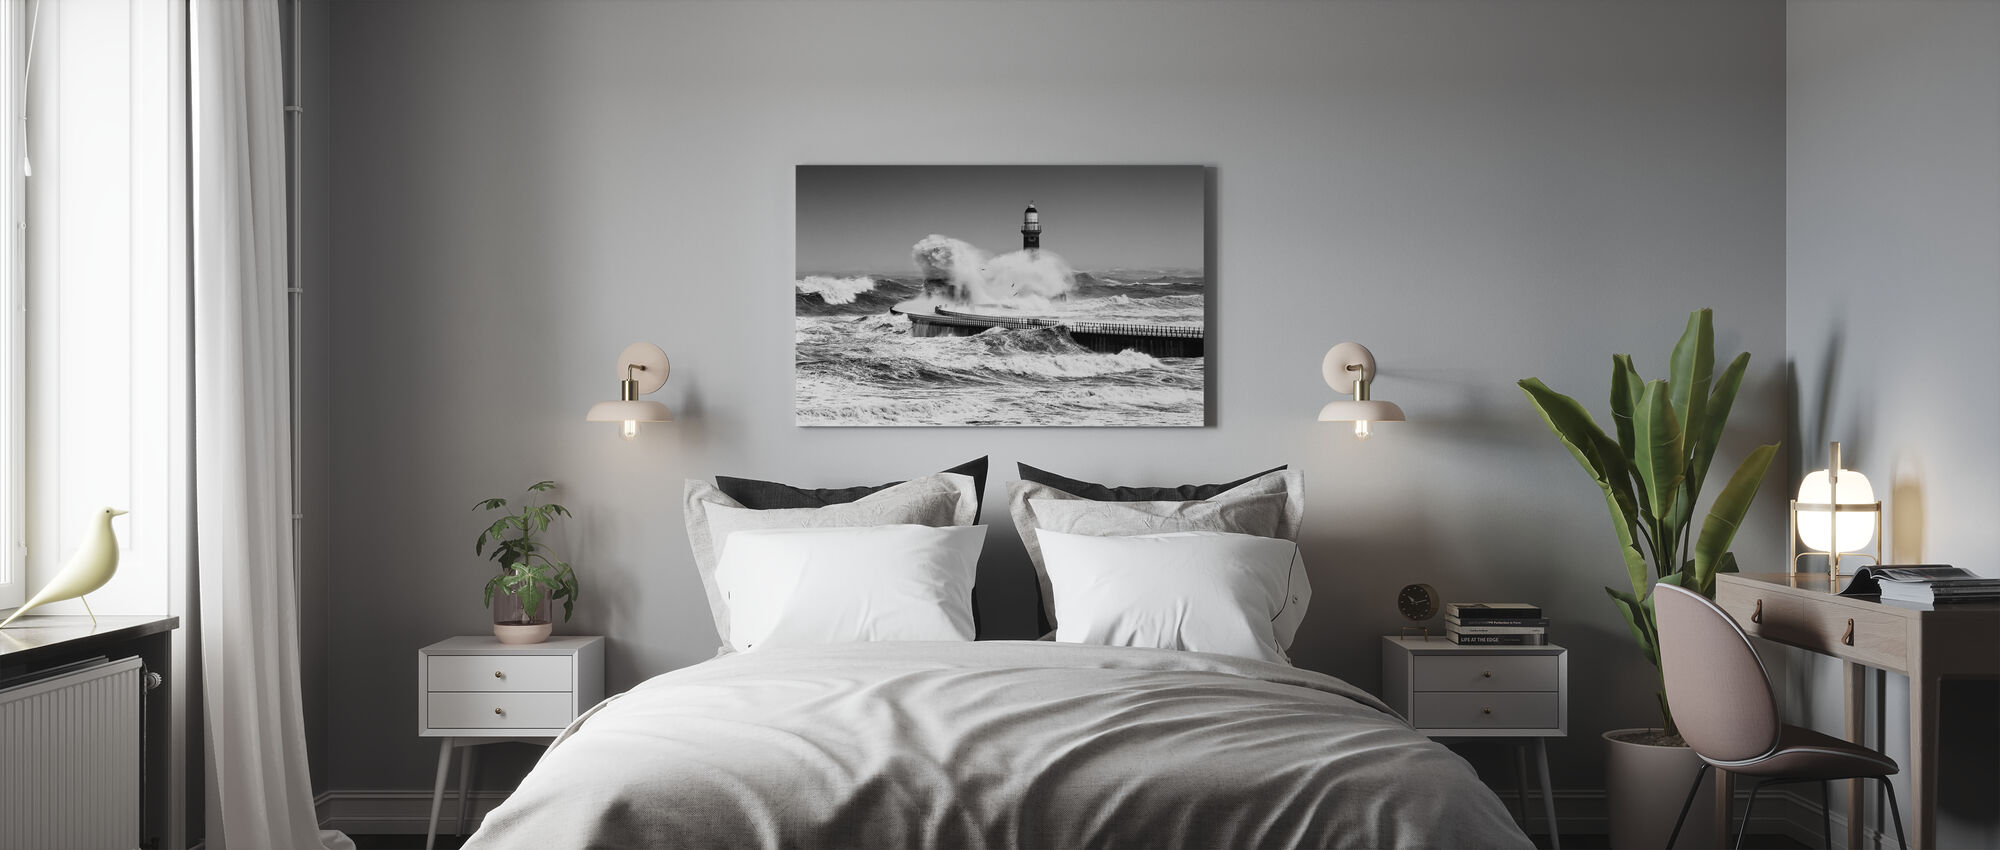 Meren voima - Canvastaulu - Makuuhuone